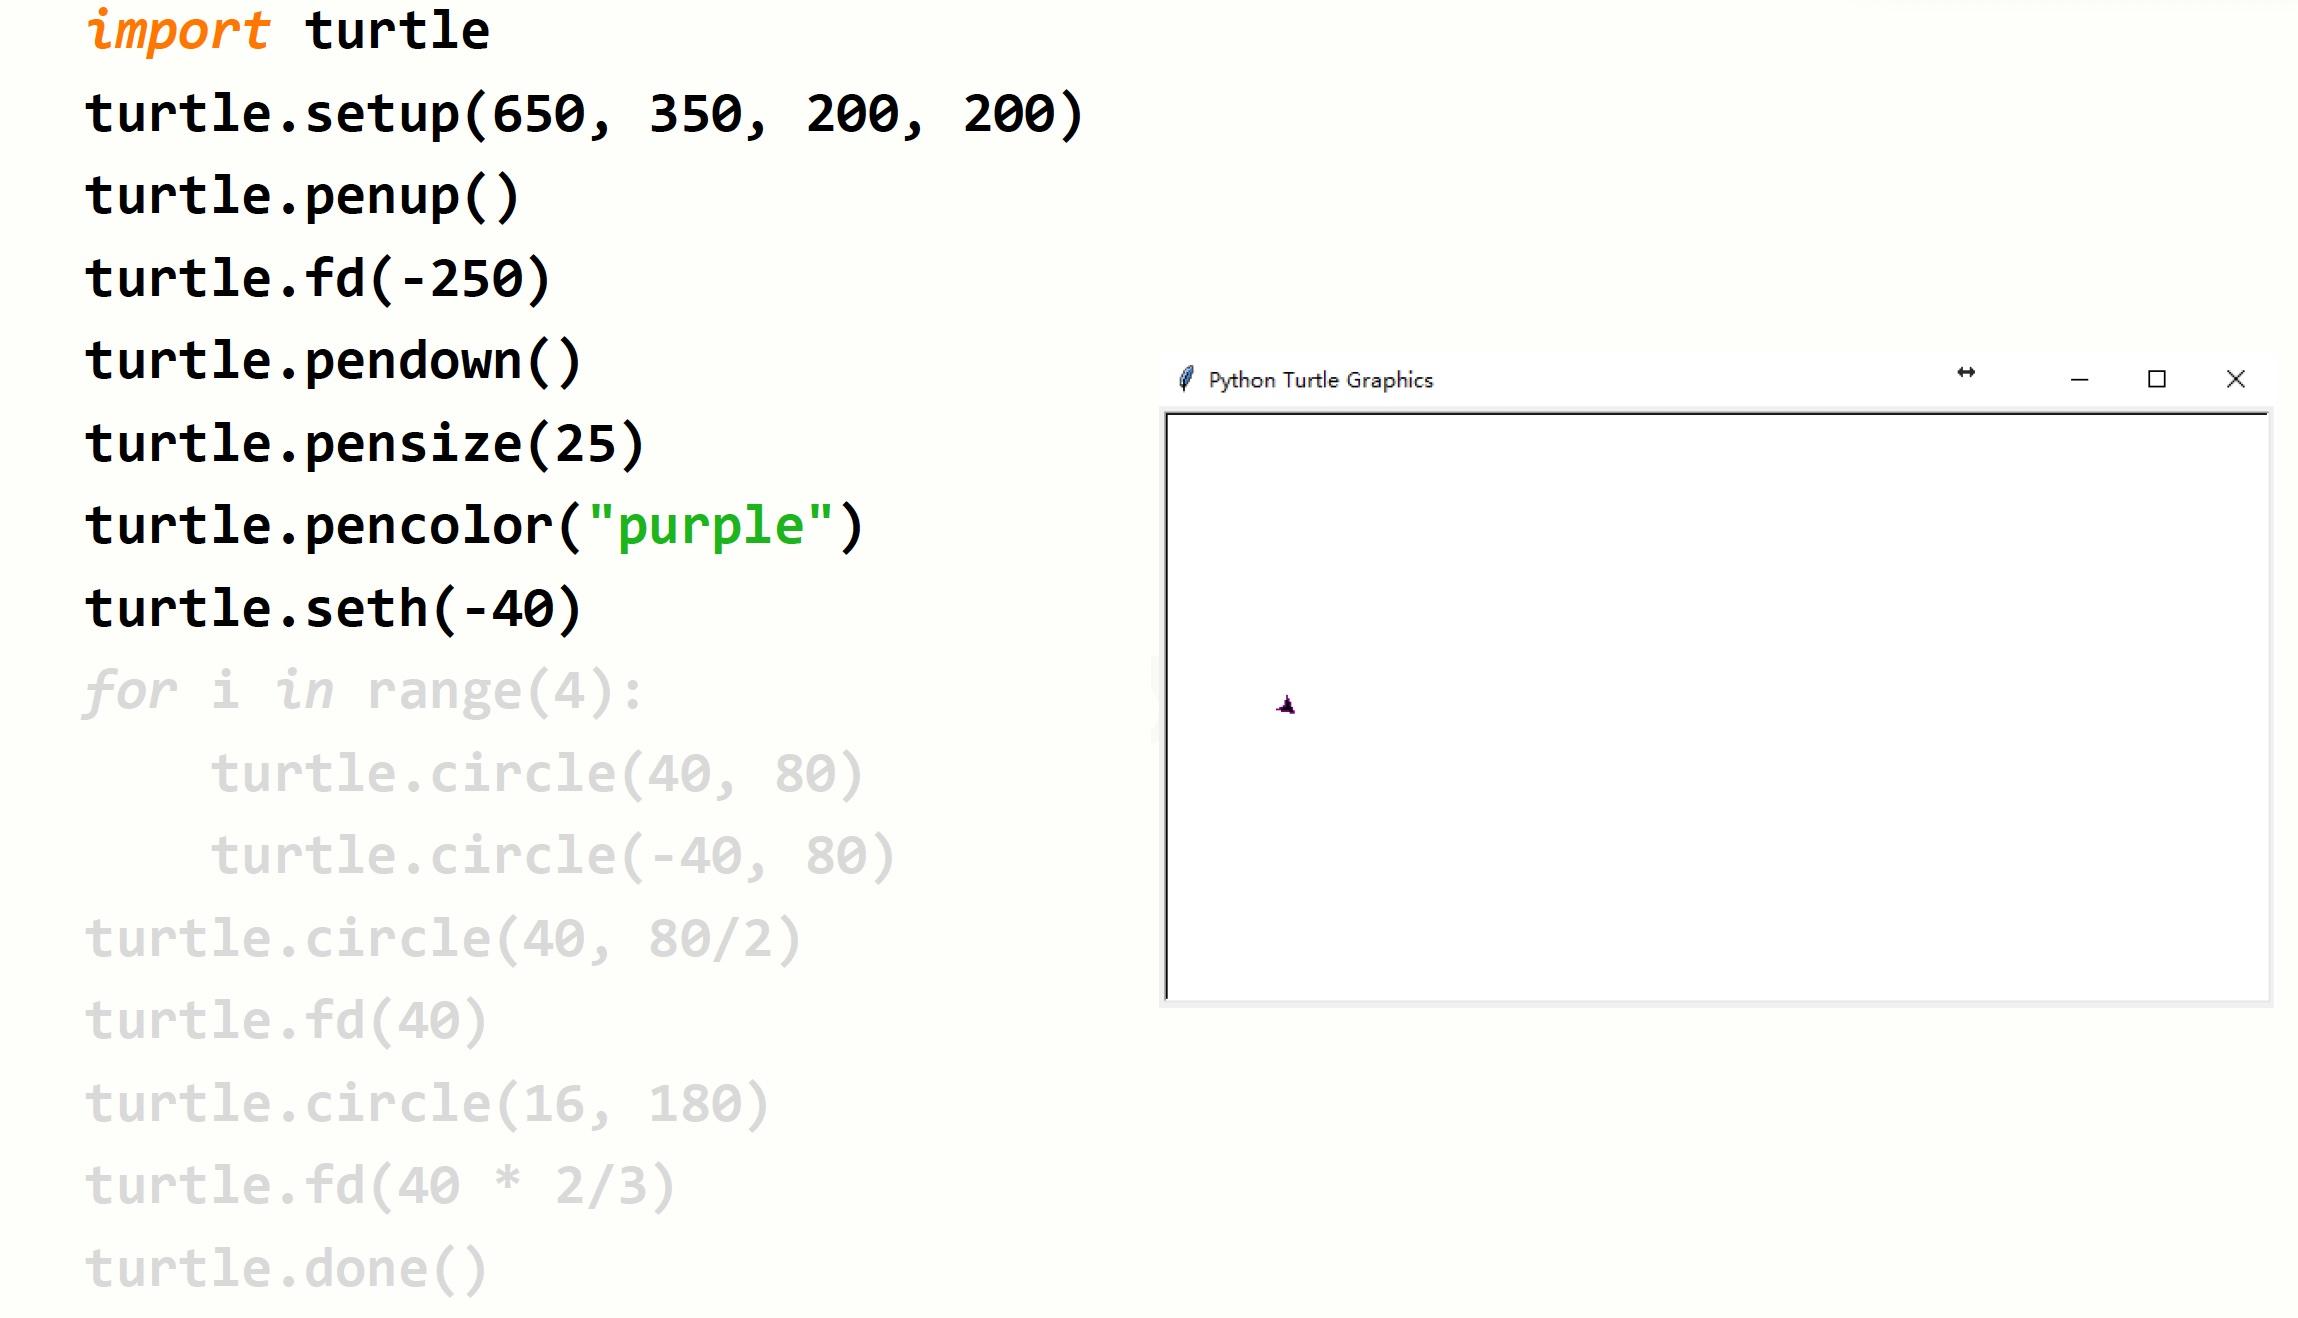 013-turtle程序语法元素分析-11.jpg?x-oss-process=style/watermark